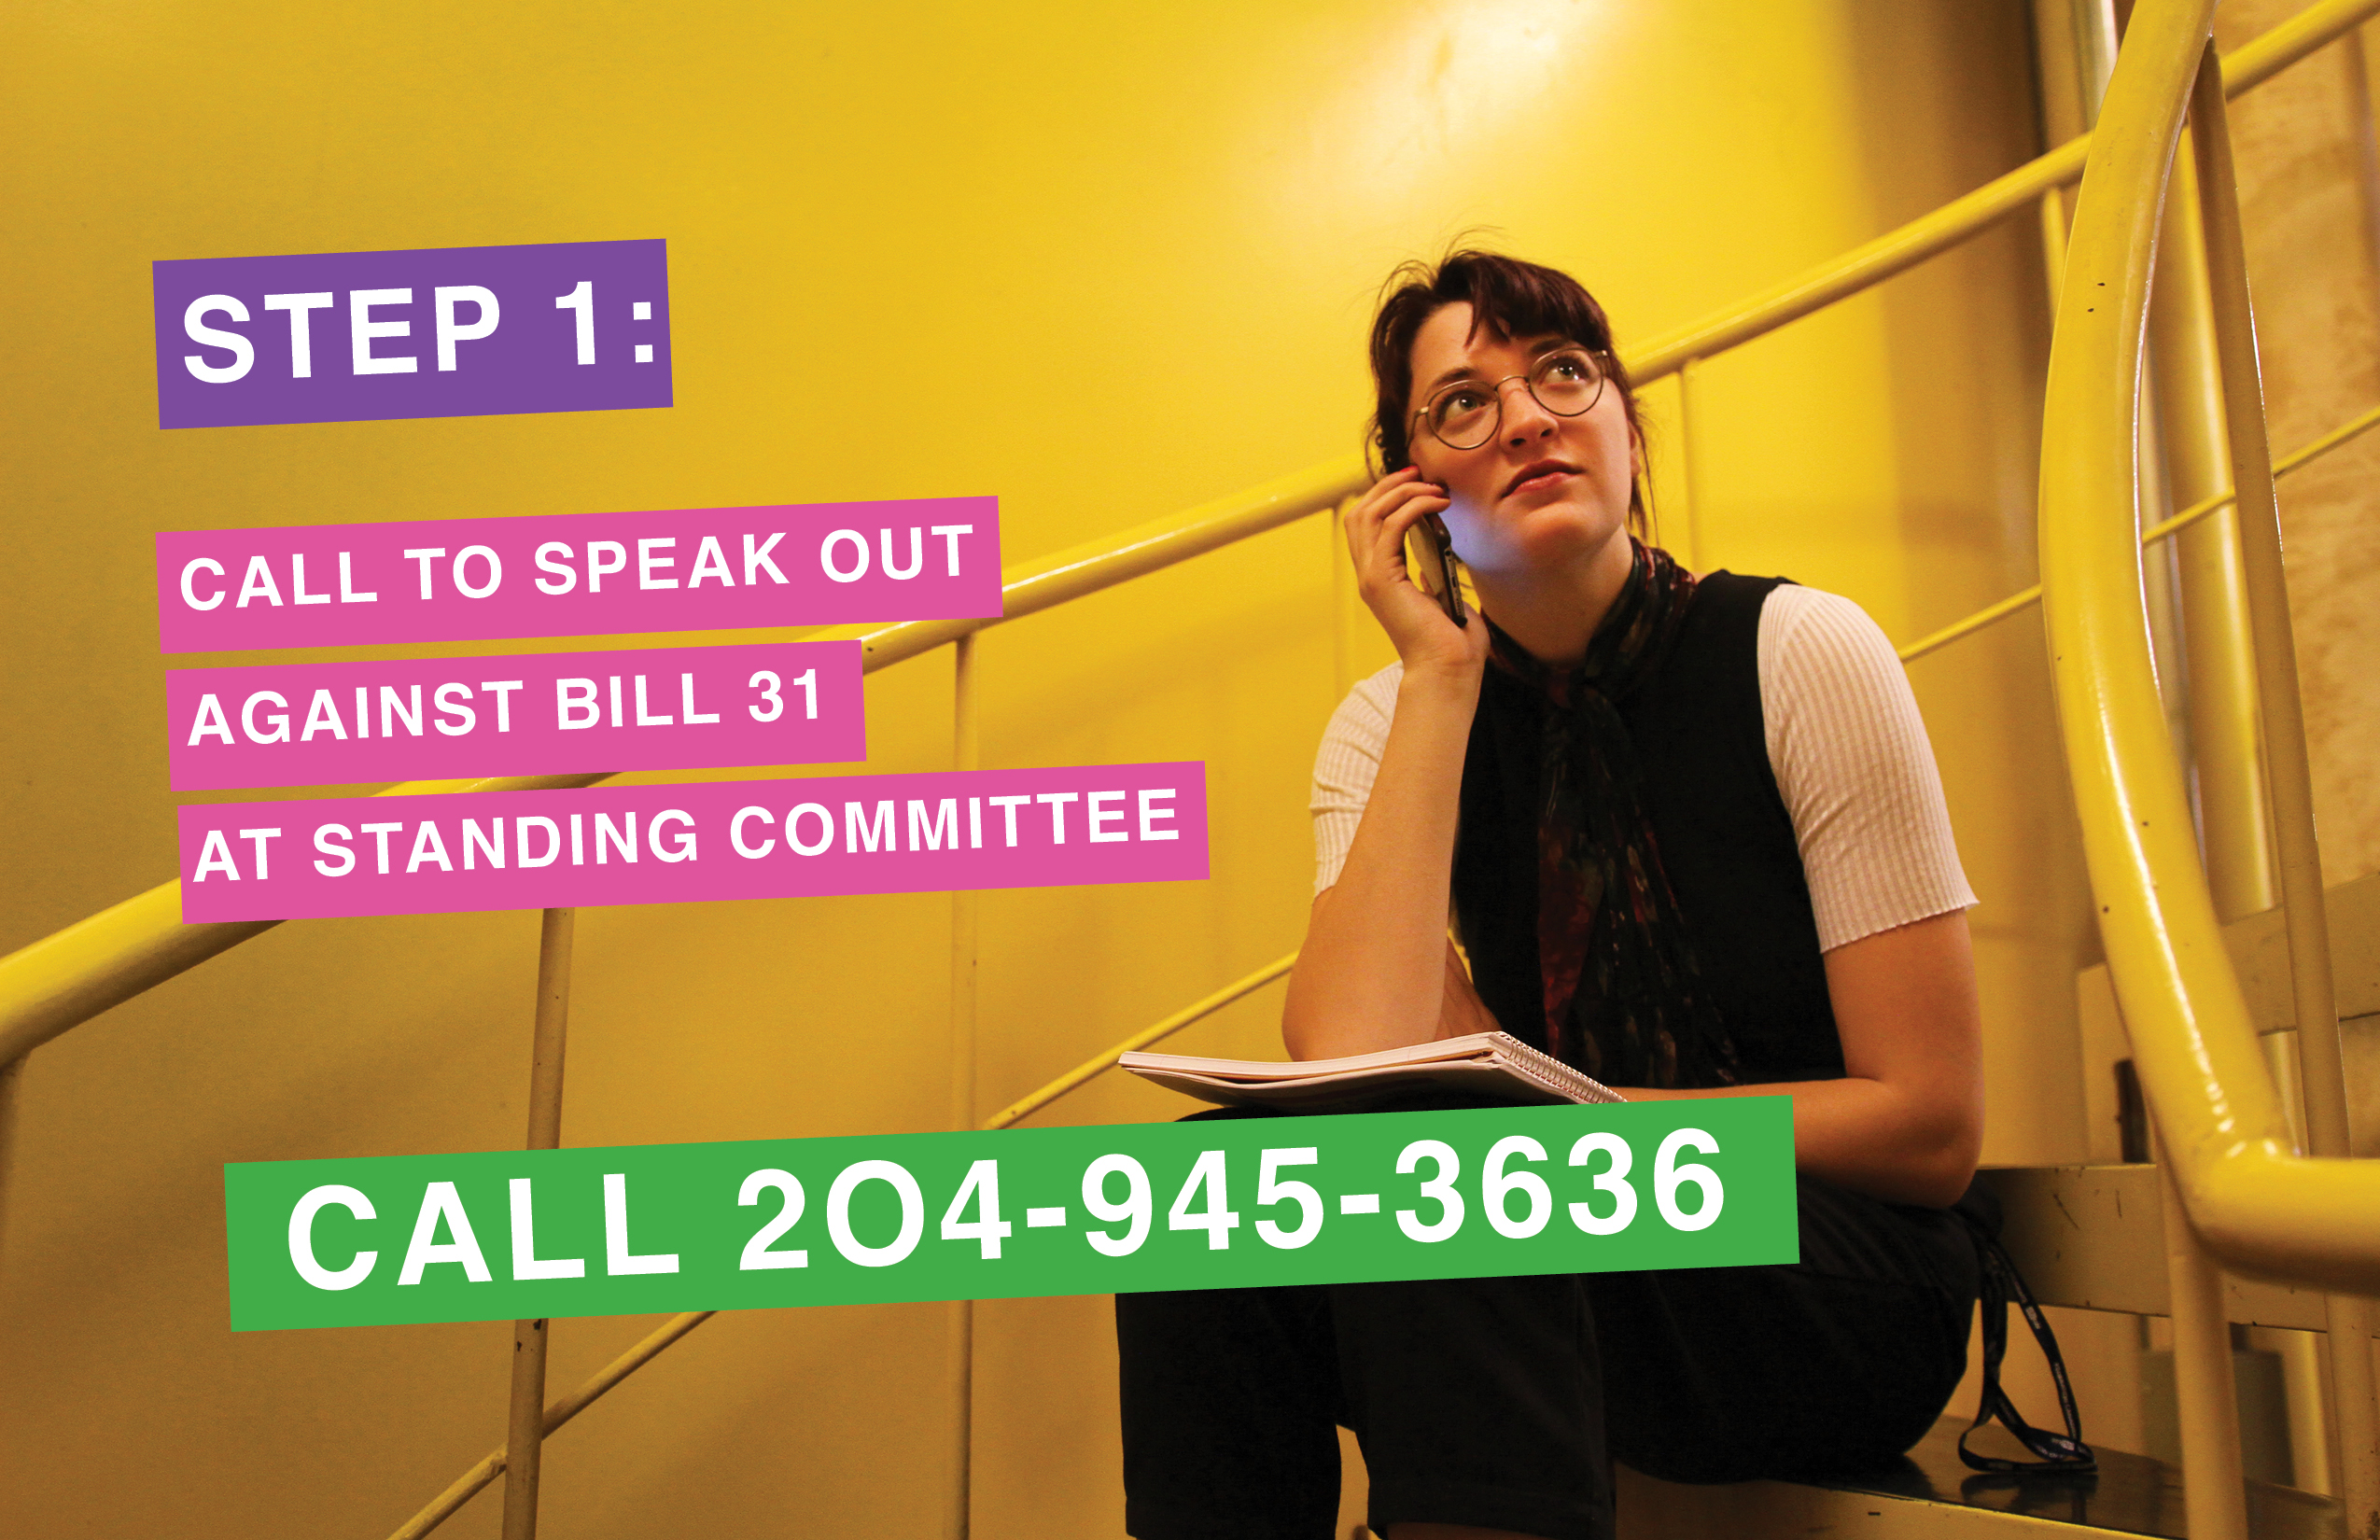 Step 1 - Bill 31 Campaign